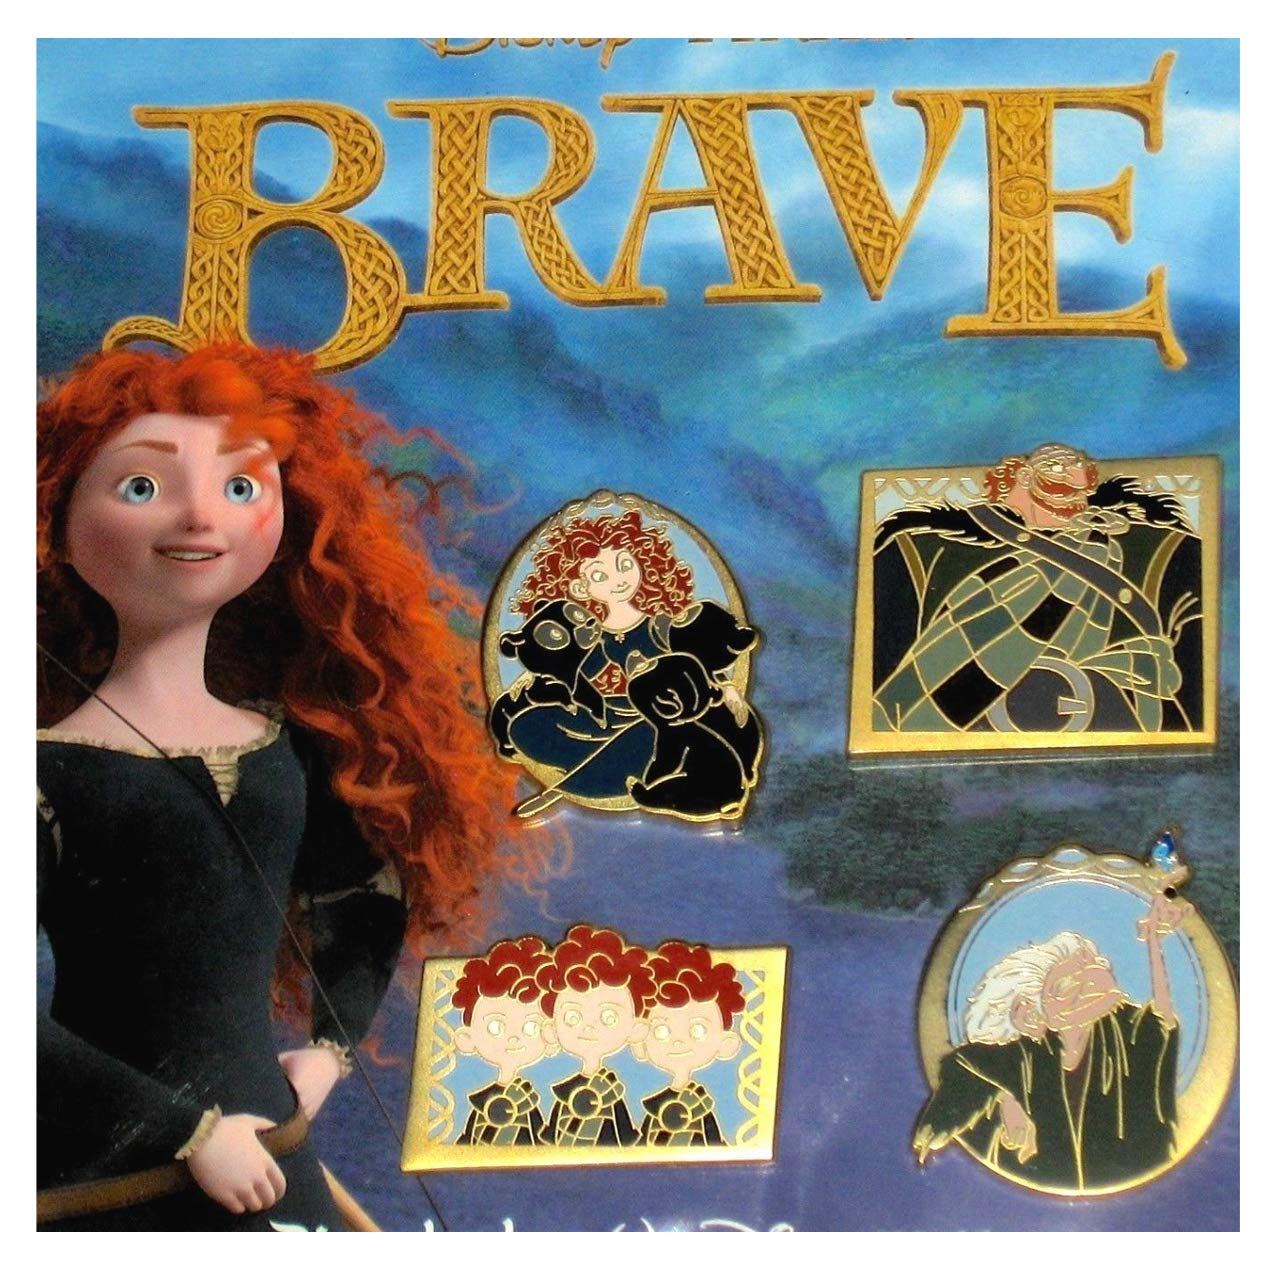 Disney Pins - Merida Brave 4 Trading Pin Booster Set